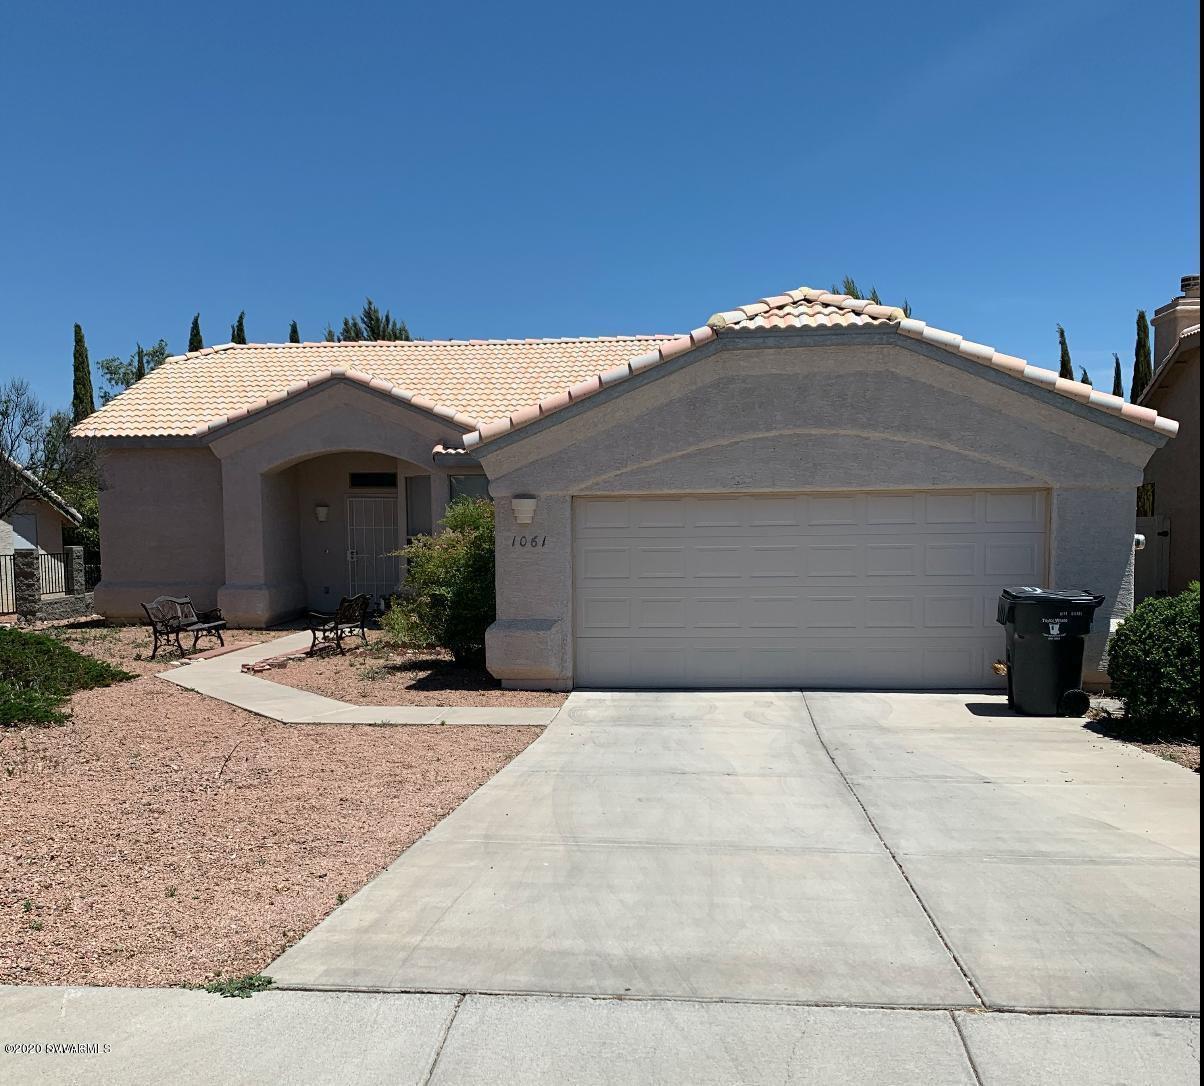 1061 S Vista Grande Drive Cottonwood, AZ 86326